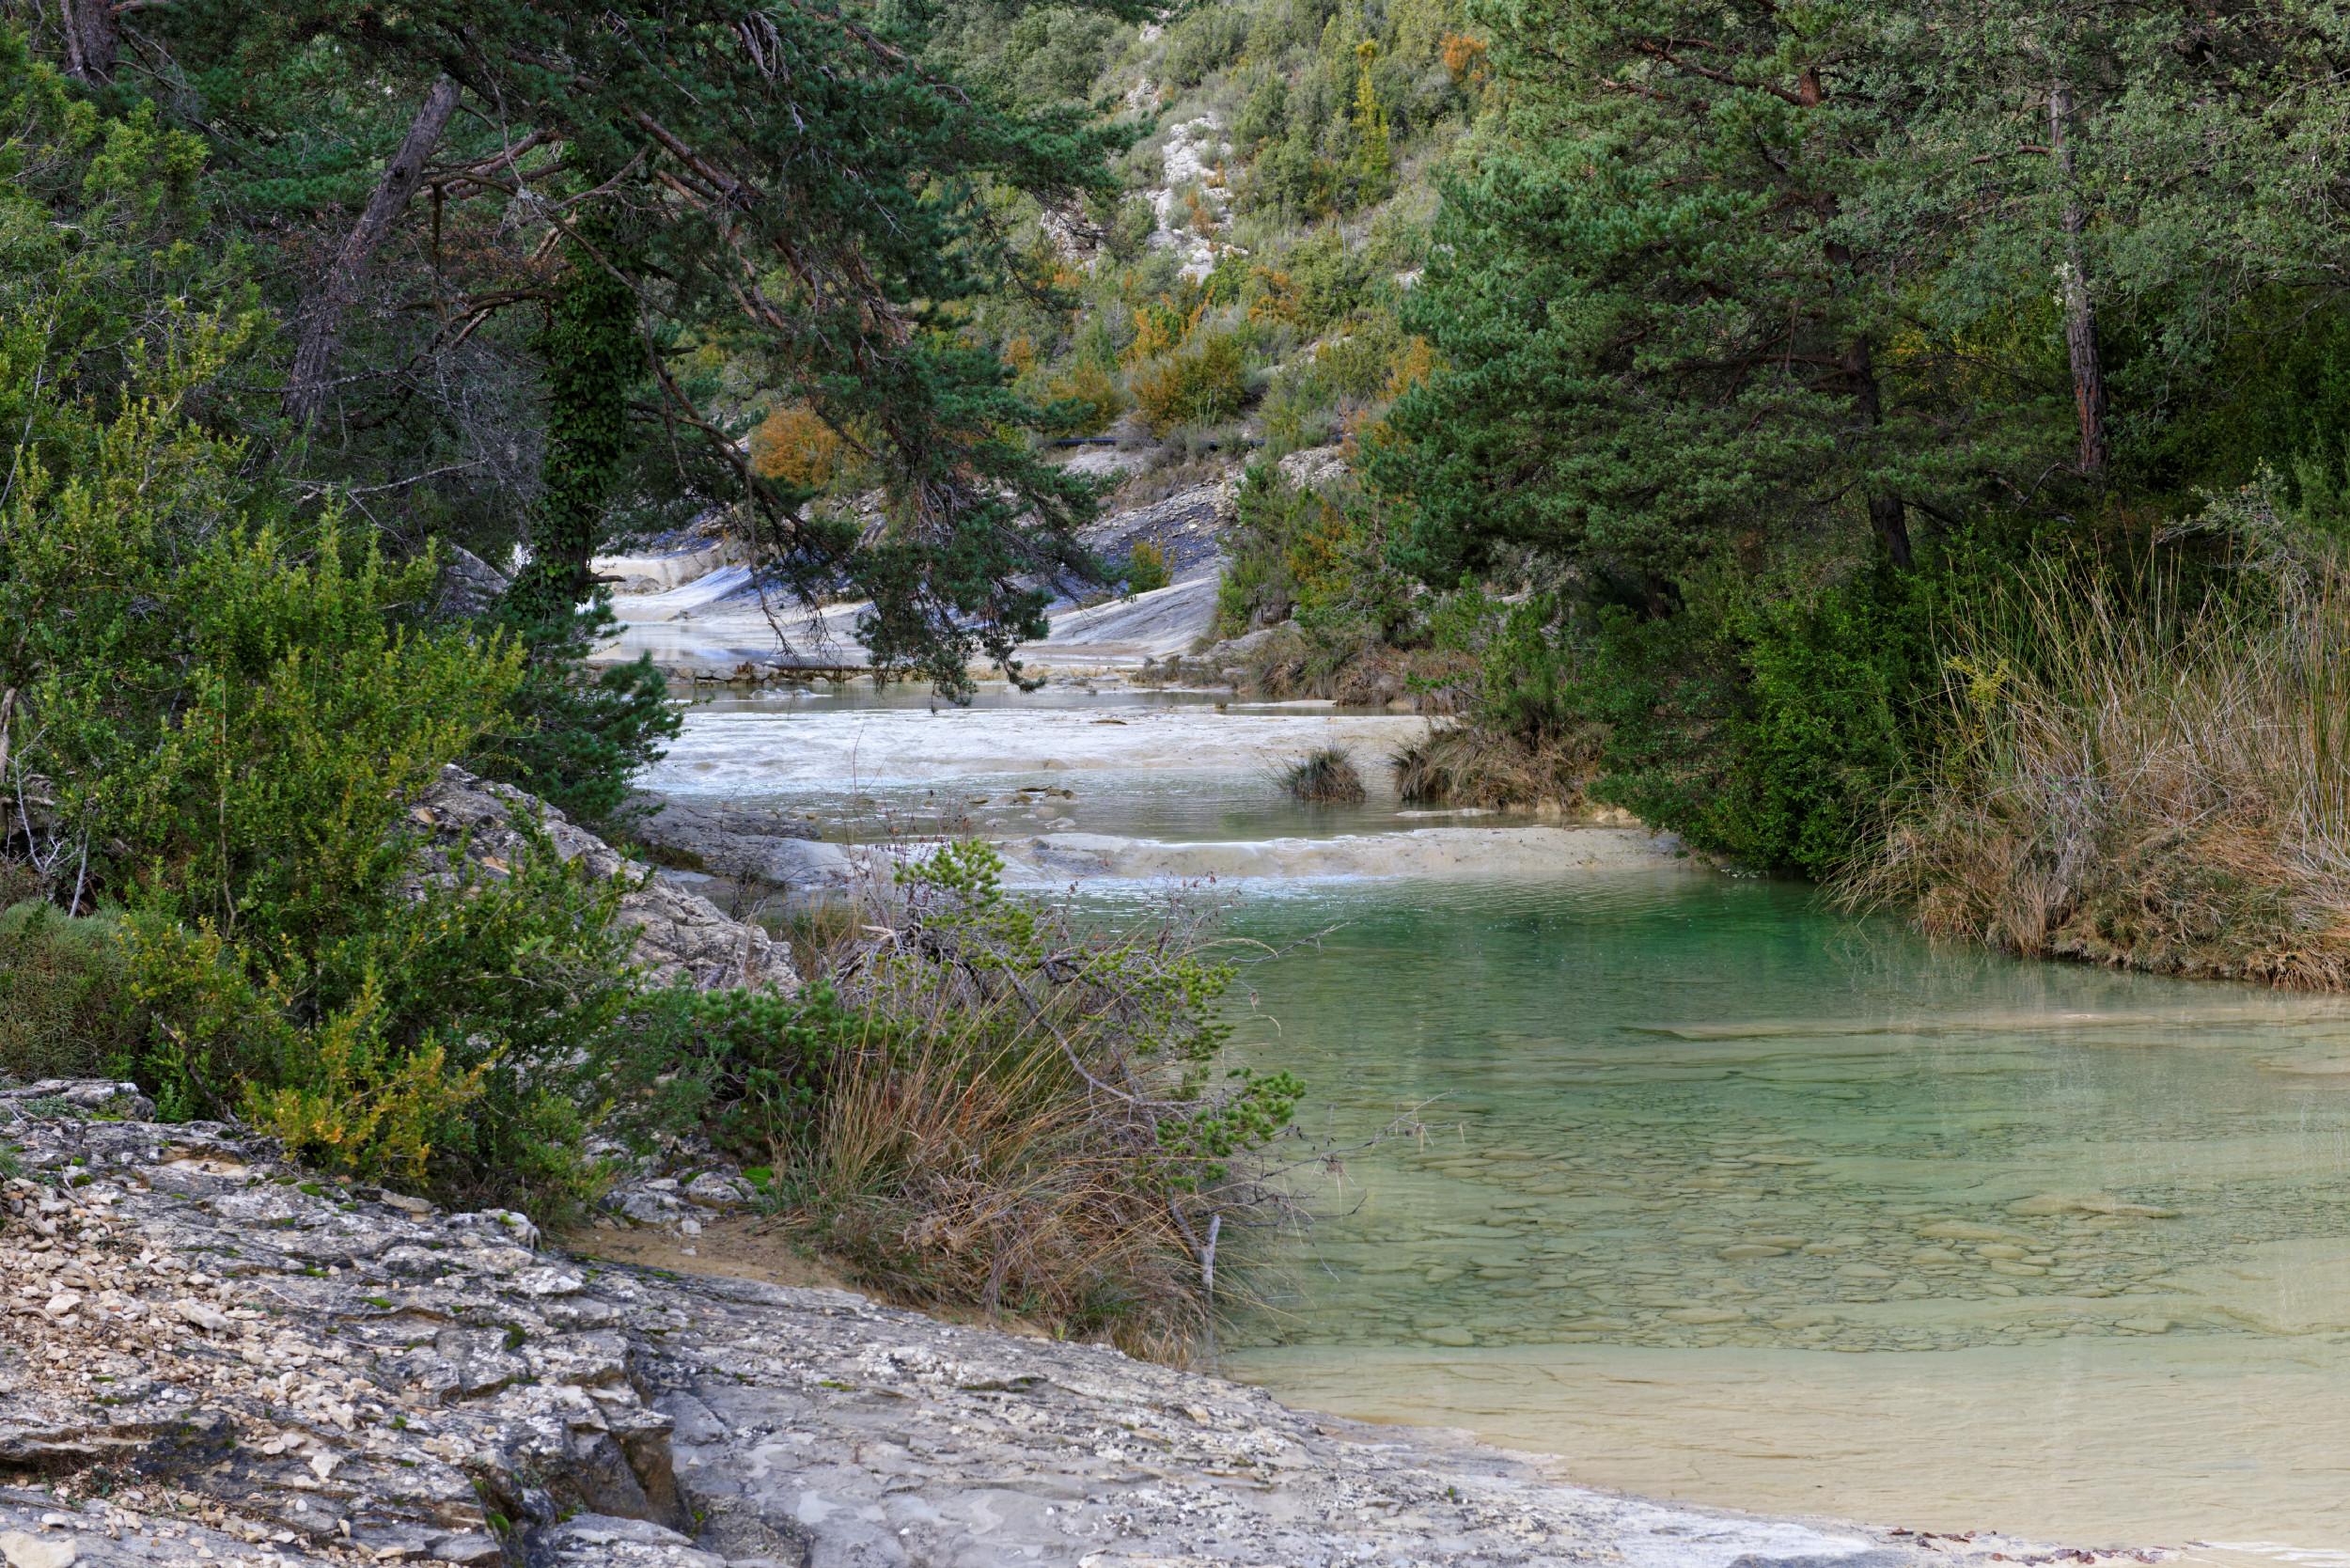 141208-Sieste - Canyon et Barranco (Sobrarbe) (25)